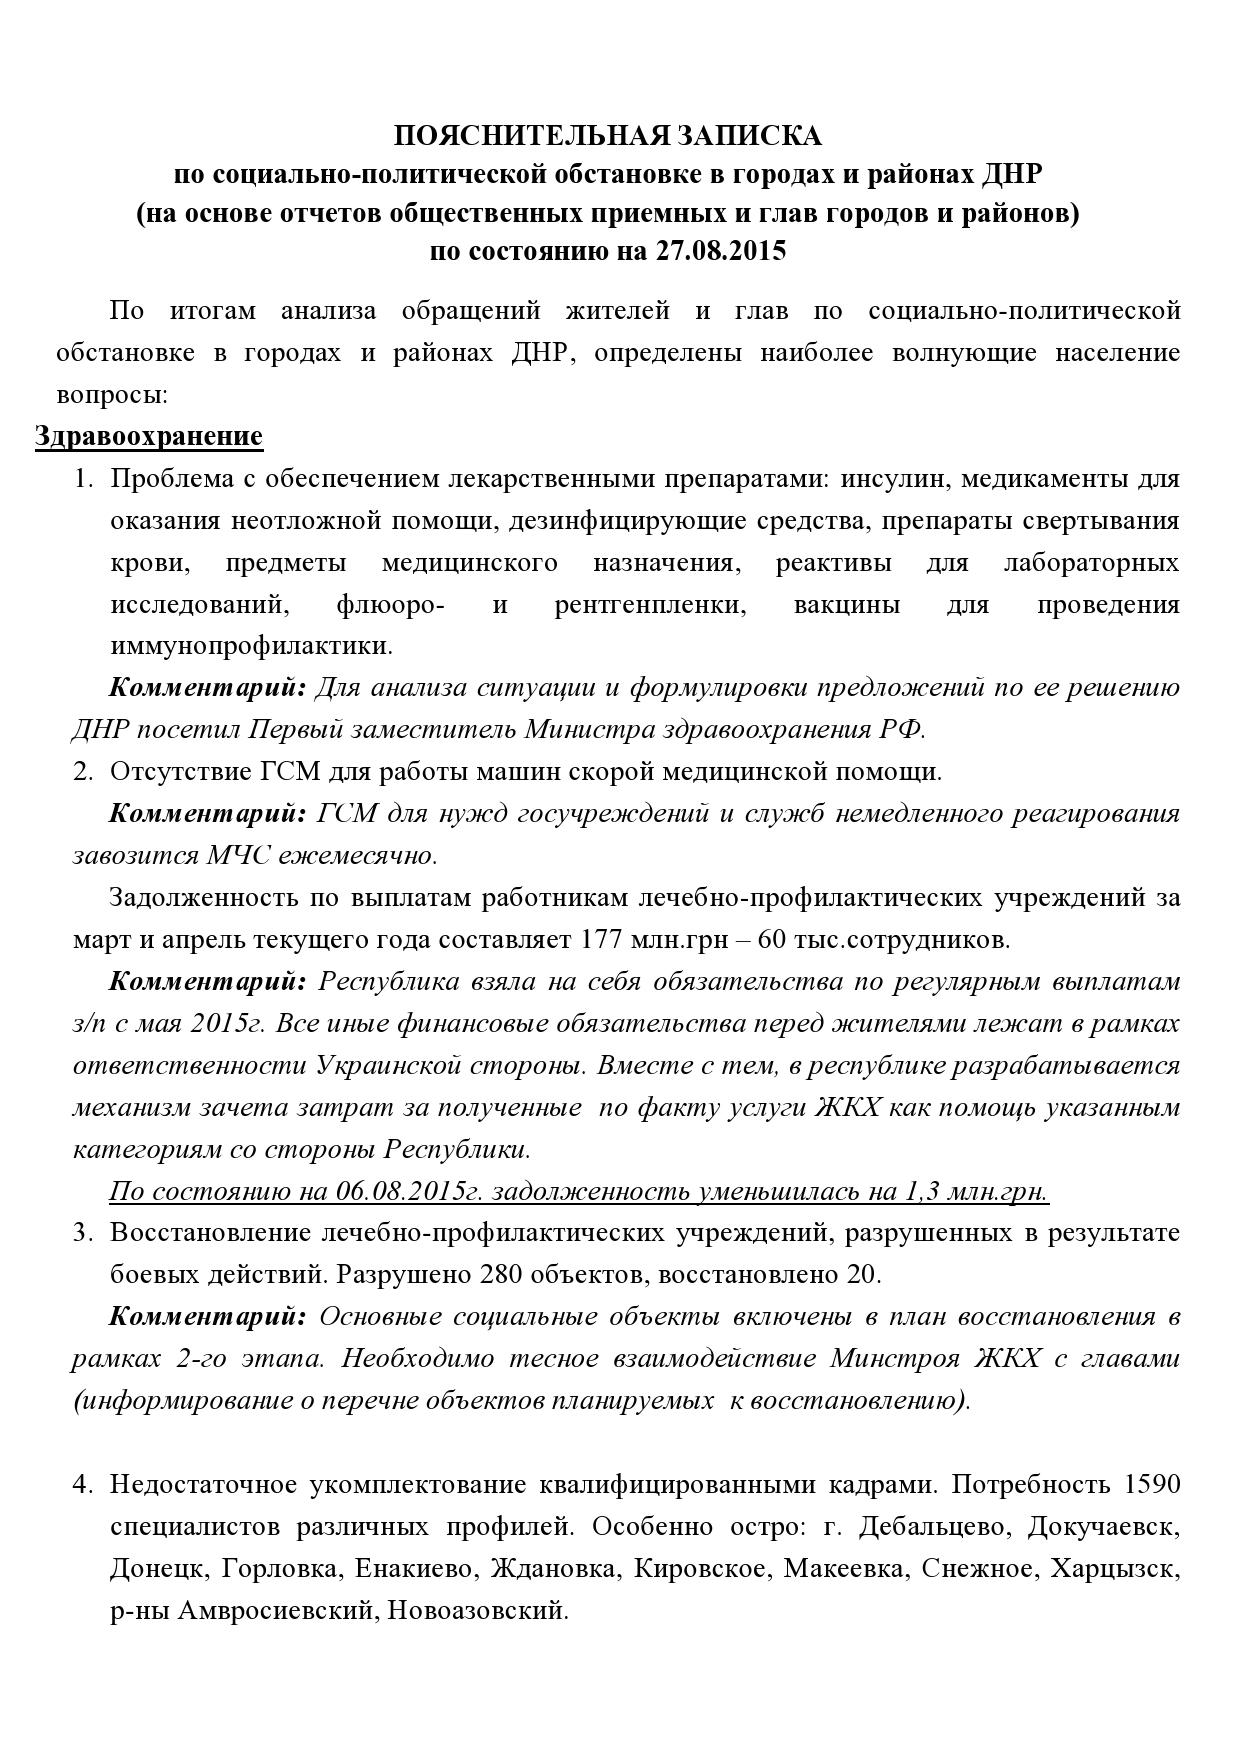 https://b0ltai.files.wordpress.com/2015/09/page00014.jpg